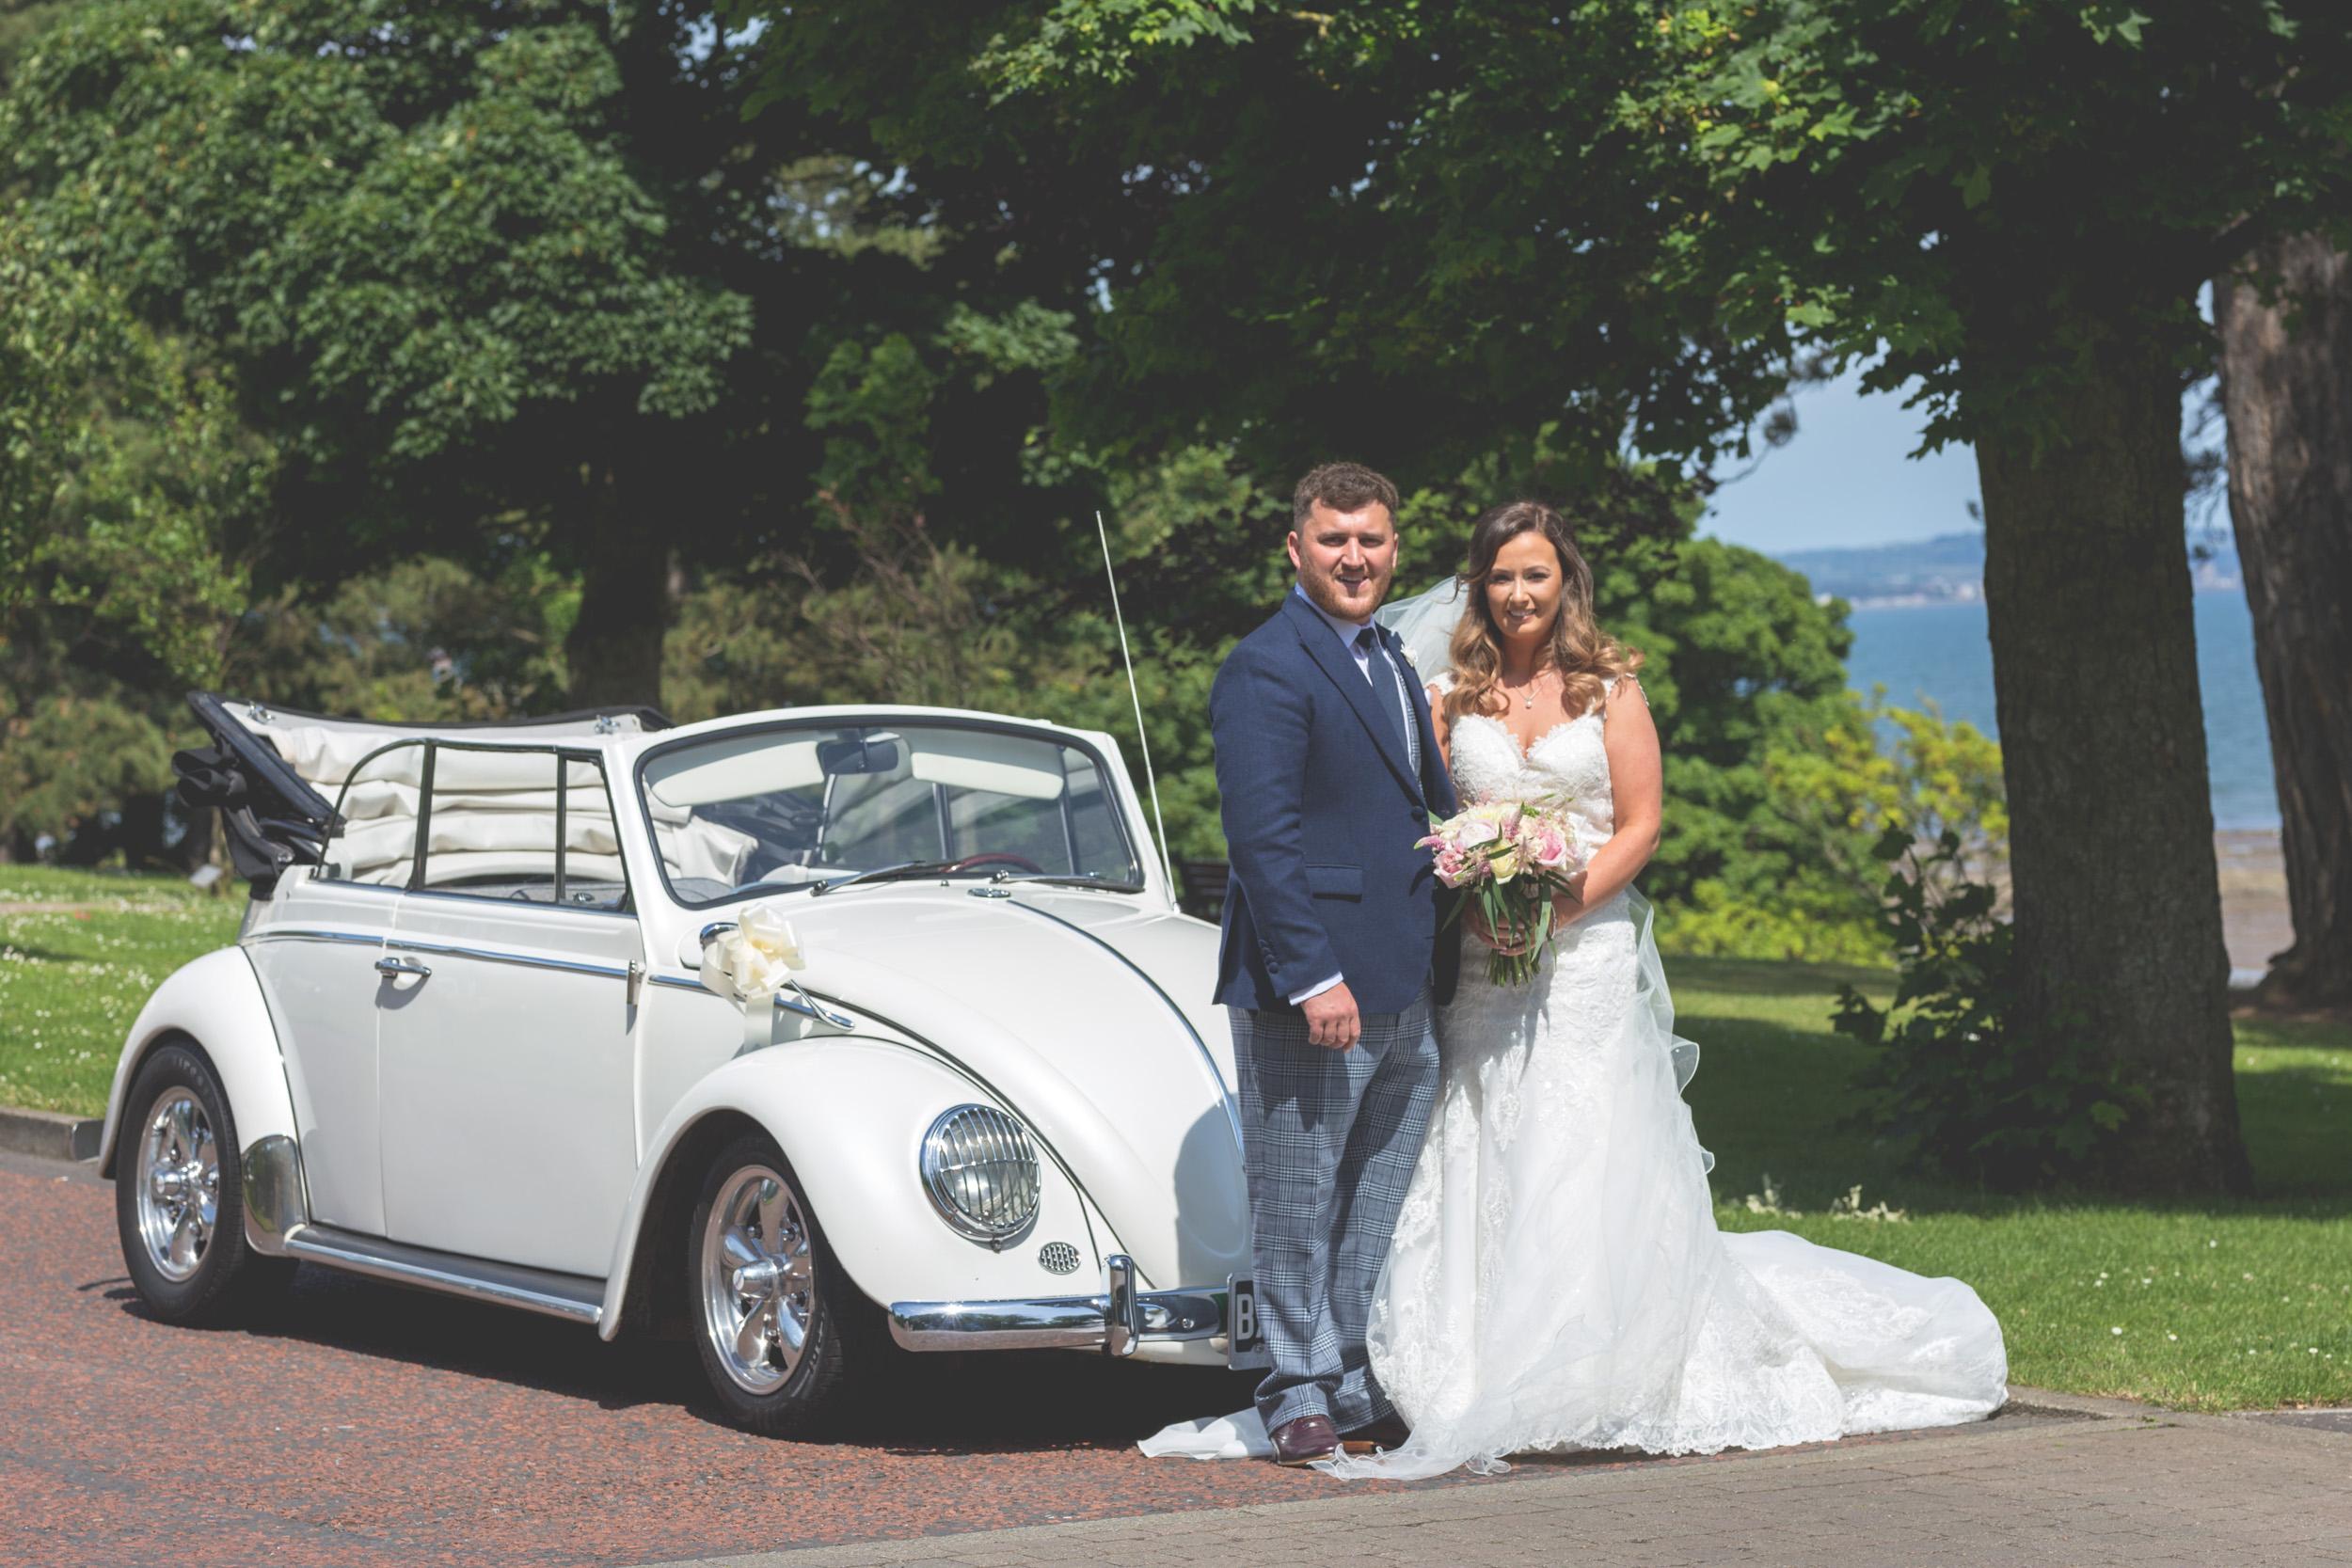 Brian McEwan   Northern Ireland Wedding Photographer   Rebecca & Michael   Portraits-11.jpg